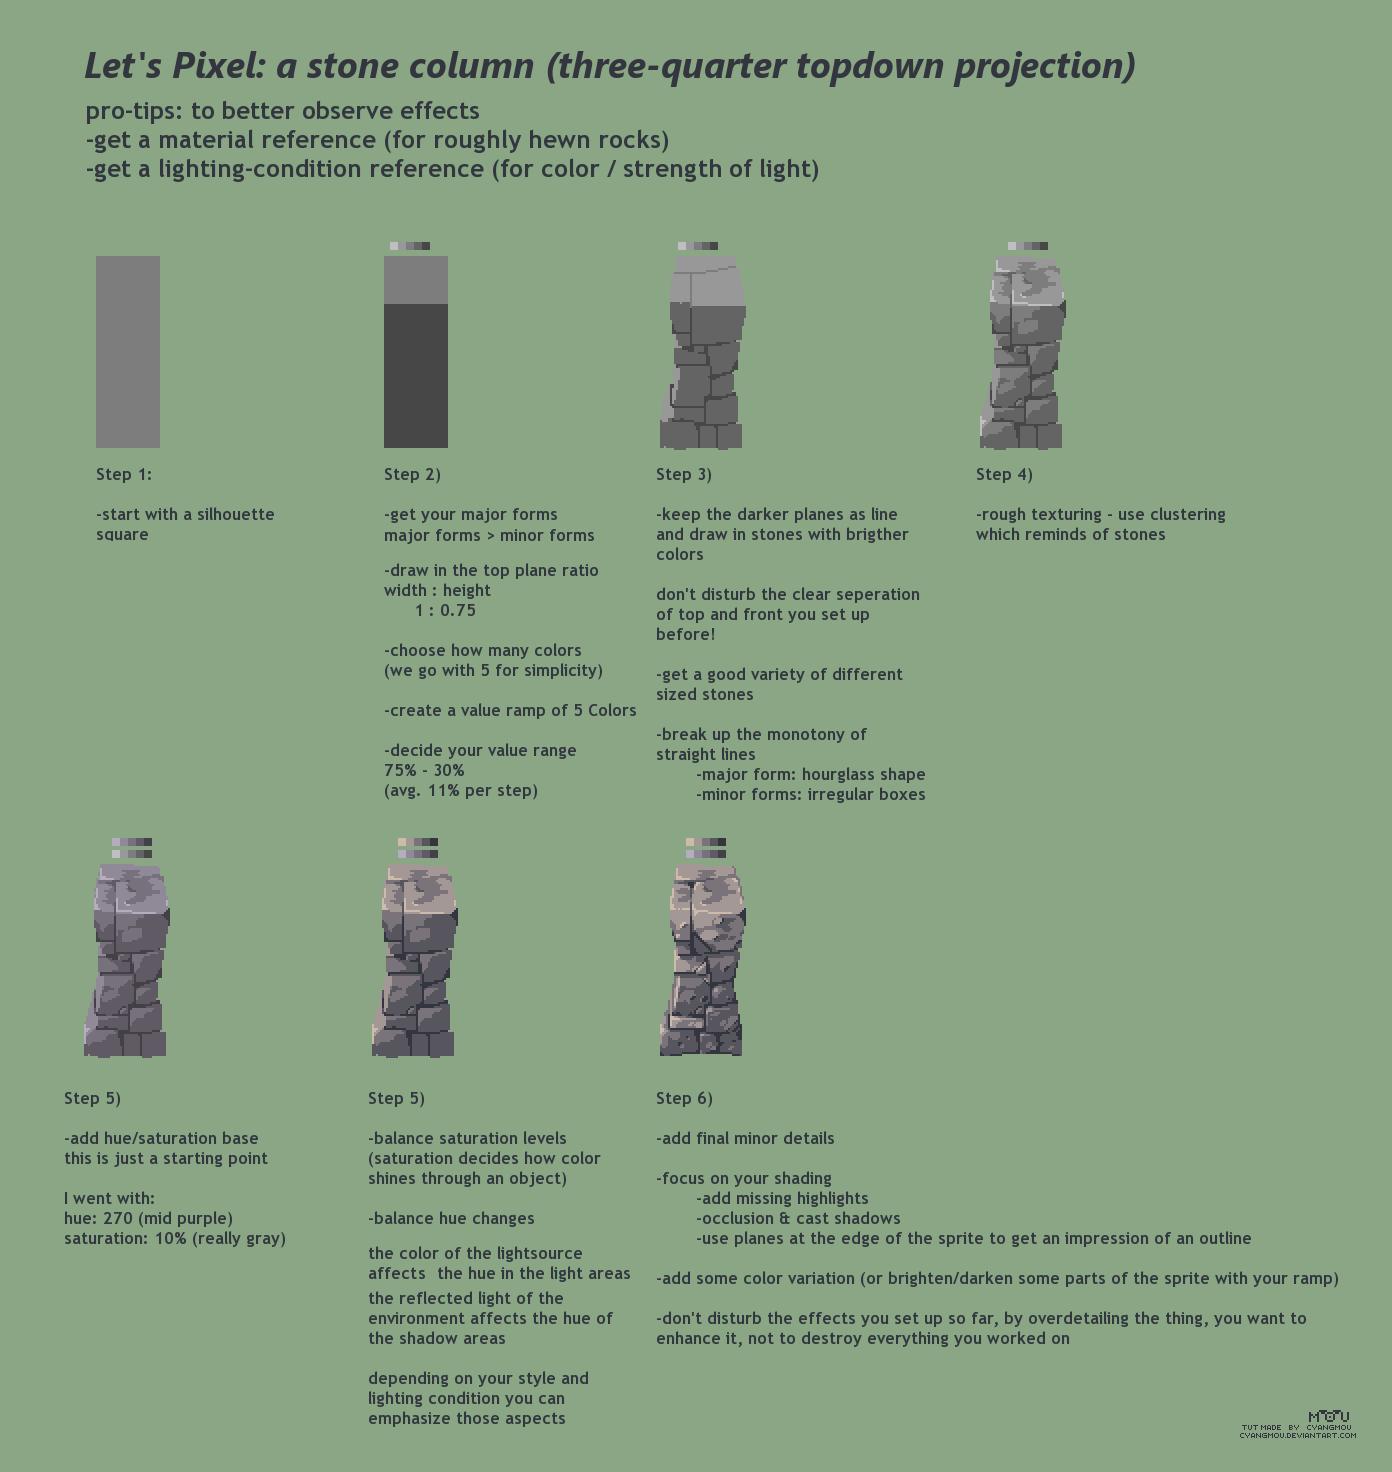 Let's Pixel: a Stone Column